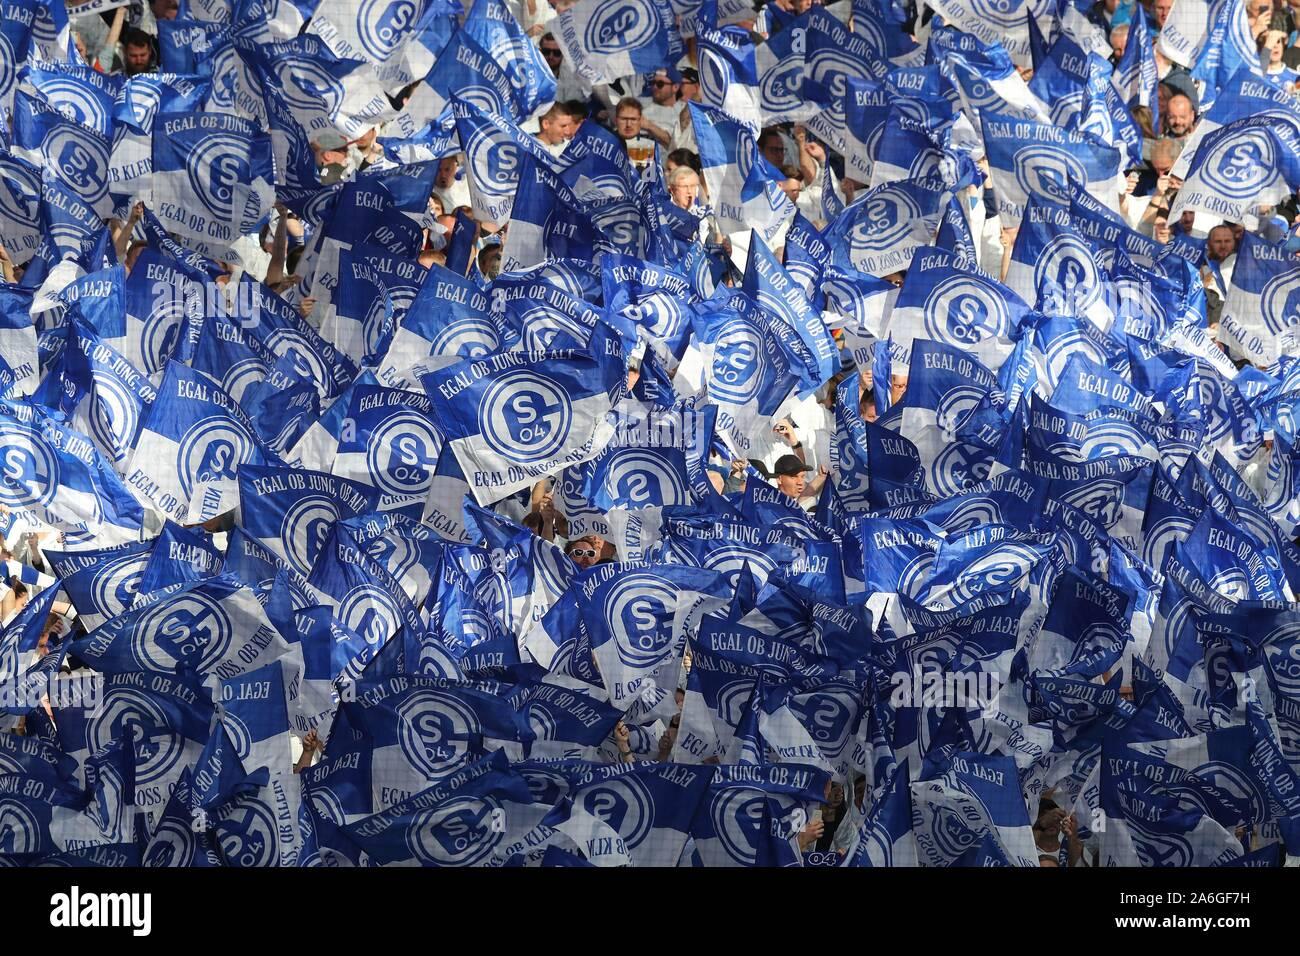 Gelsenkirchen, Deutschland. 26th Oct, 2019. firo: 26.10.2019, Football, 1.Bundesliga, Season 2019/2020, Derby, Revierderby, FC Schalke 04 - BVB, Borussia Dortmund 0: 0 fans Schalke, Fahnenmeer | usage worldwide Credit: dpa/Alamy Live News Stock Photo